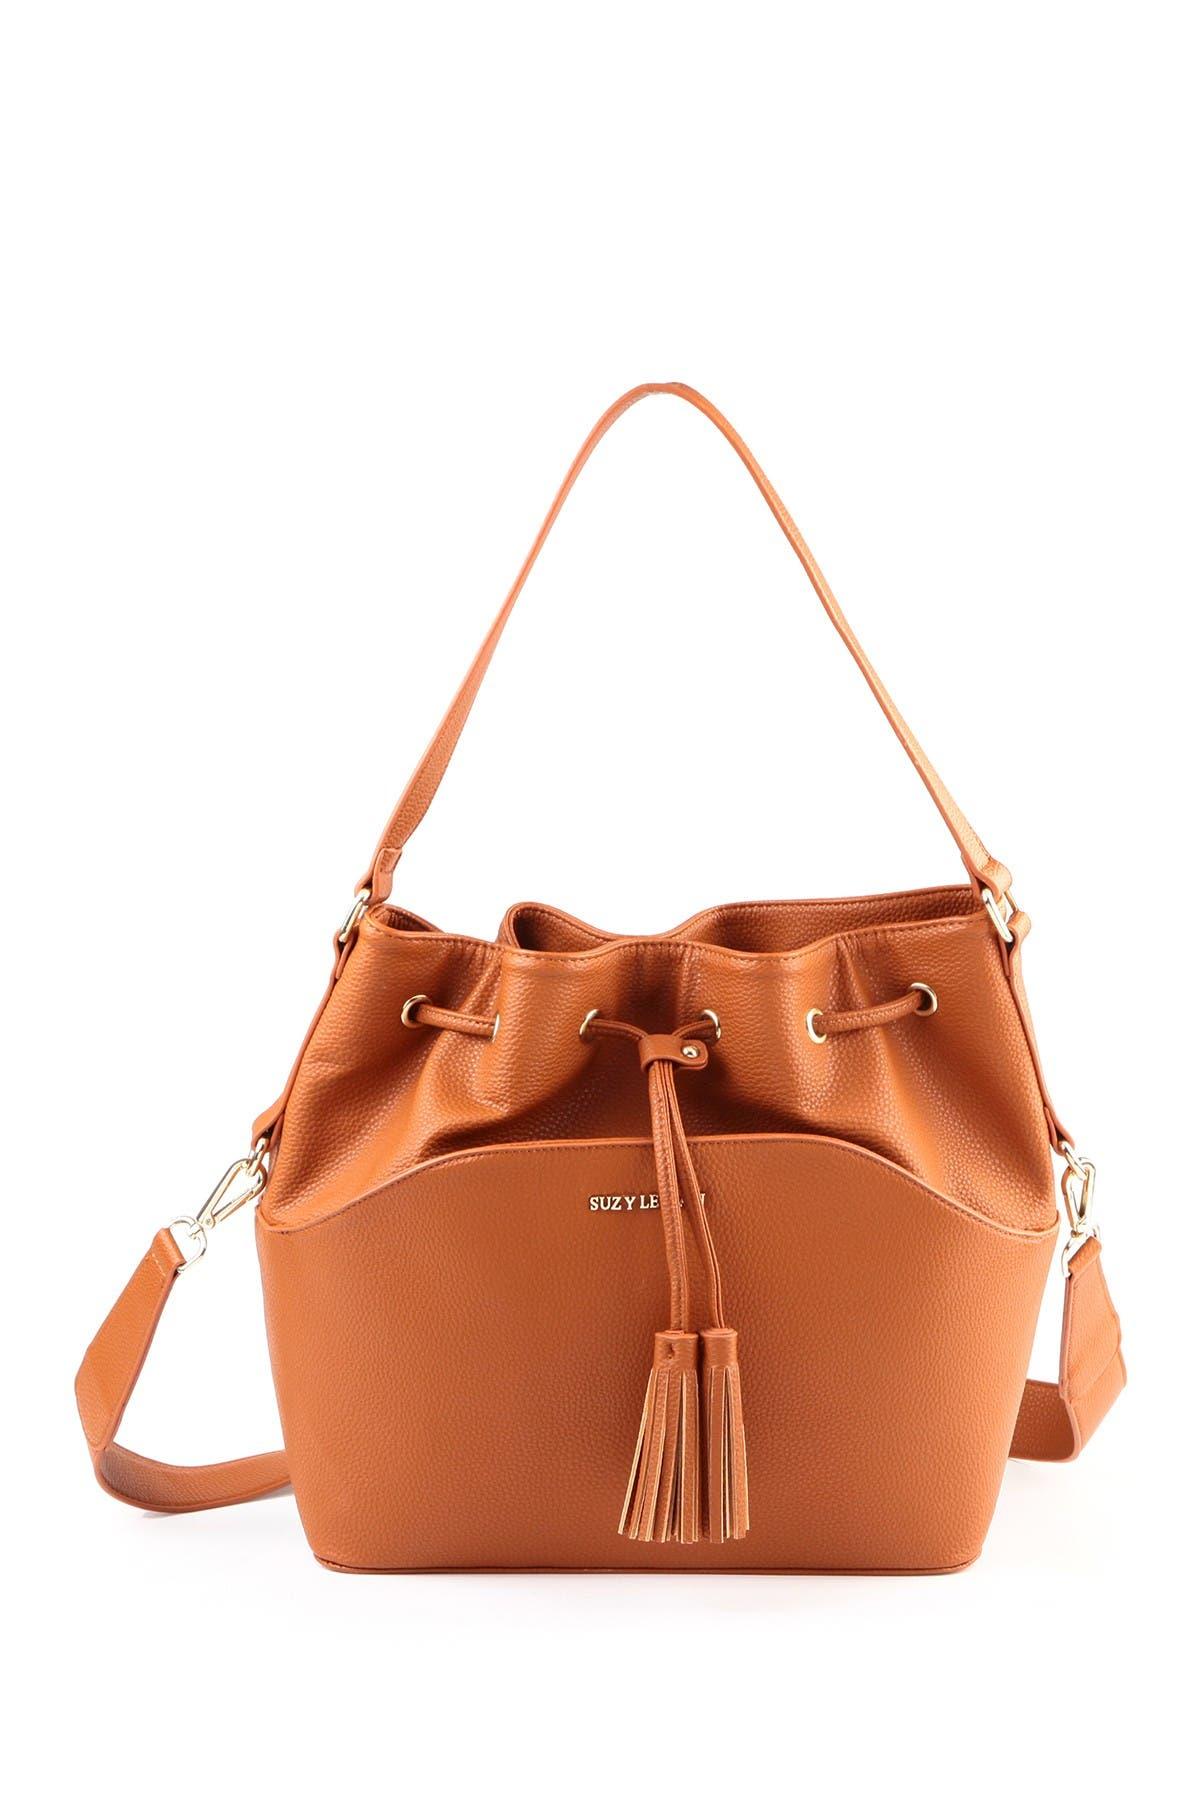 Image of Suzy Levian Tassel Drawstring Bucket Bag